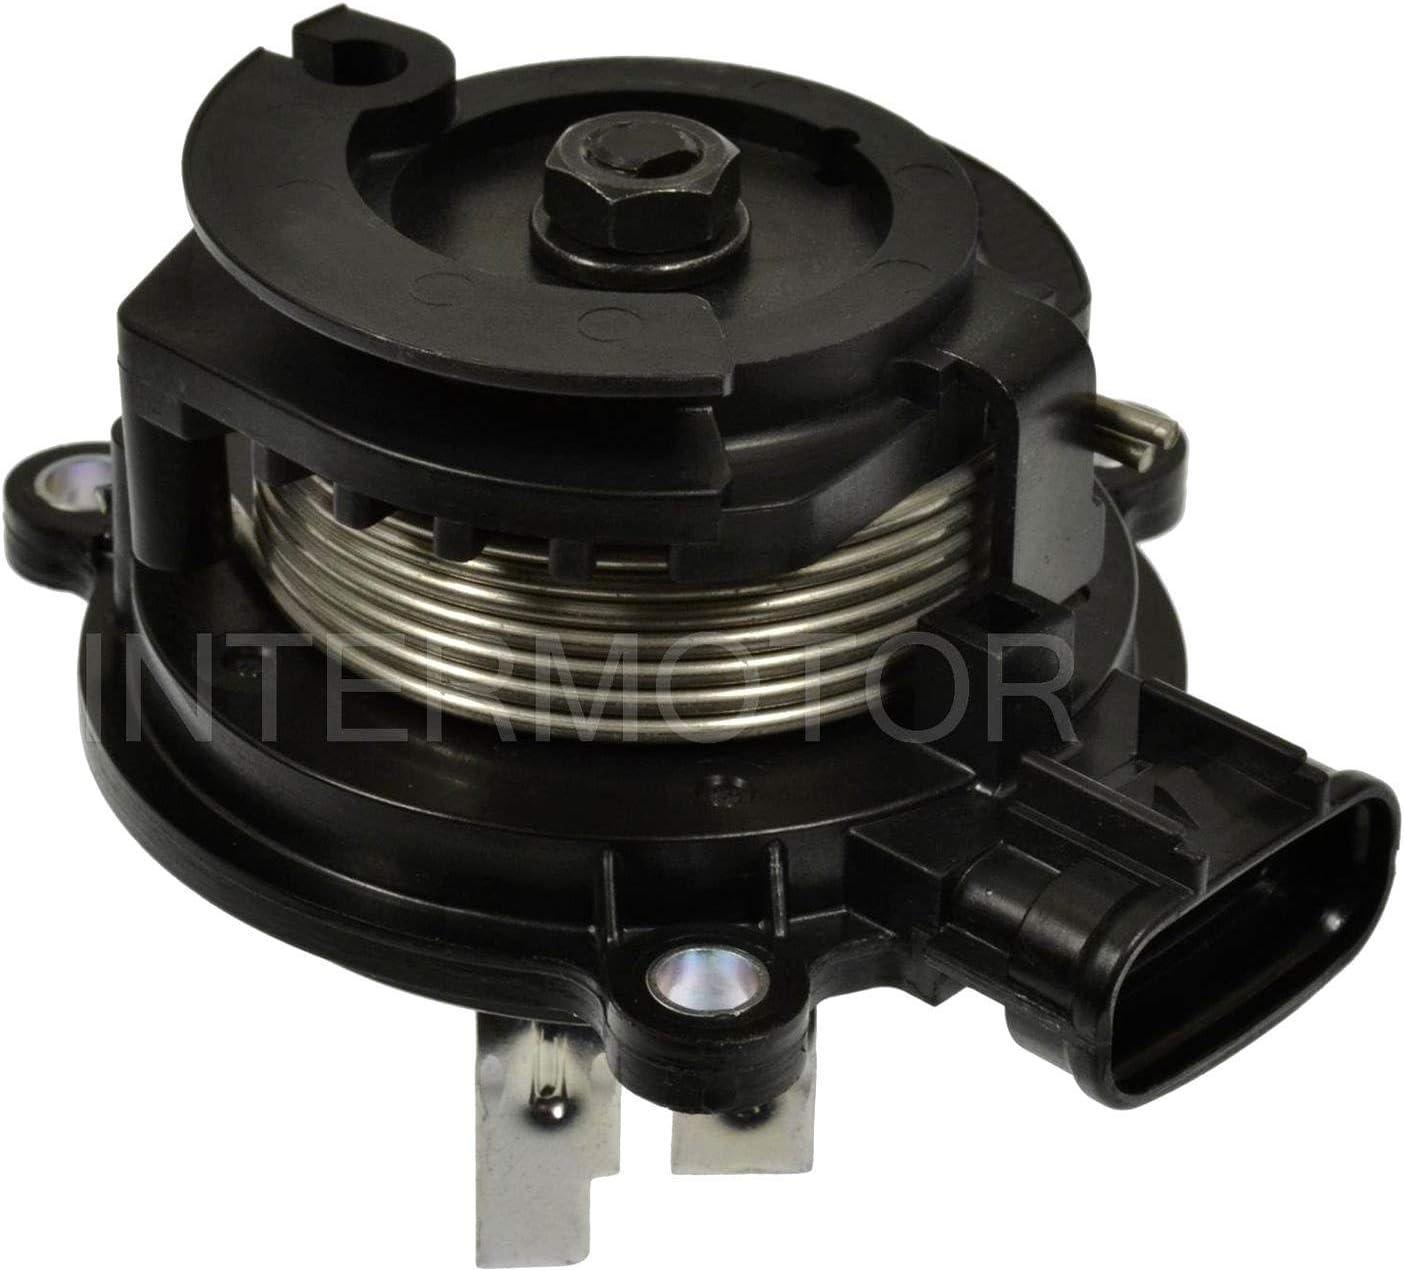 th451 Intermotor Throttle Position Sensor th451